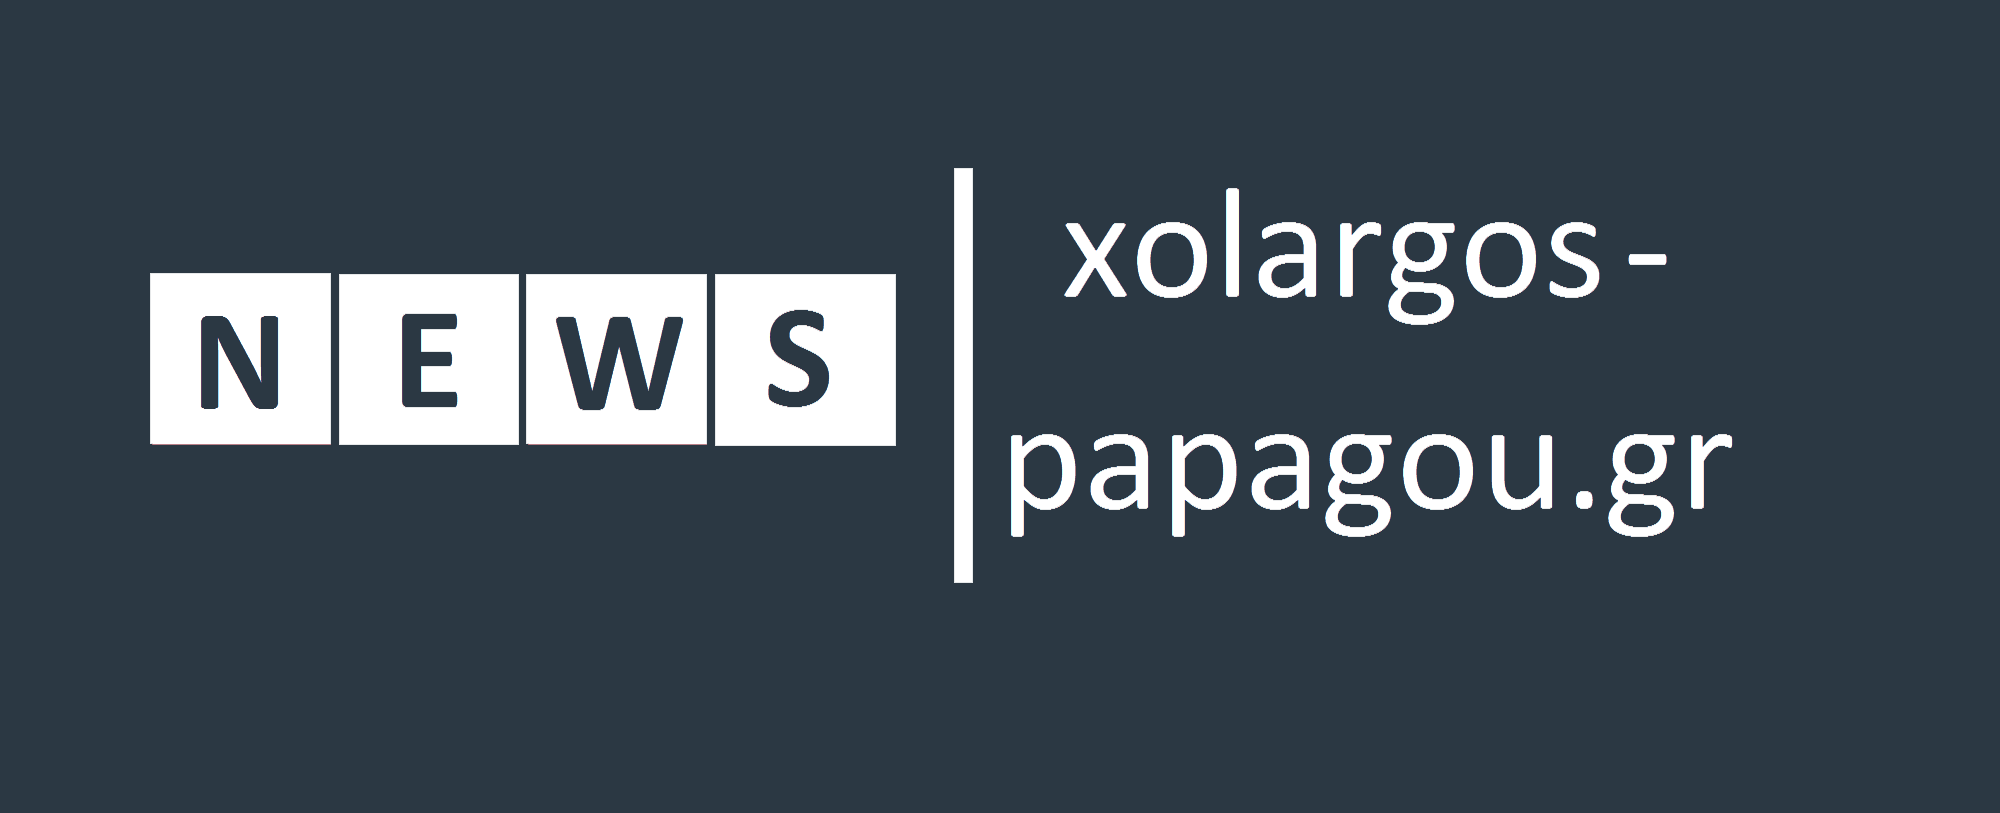 Xolargos-papagou